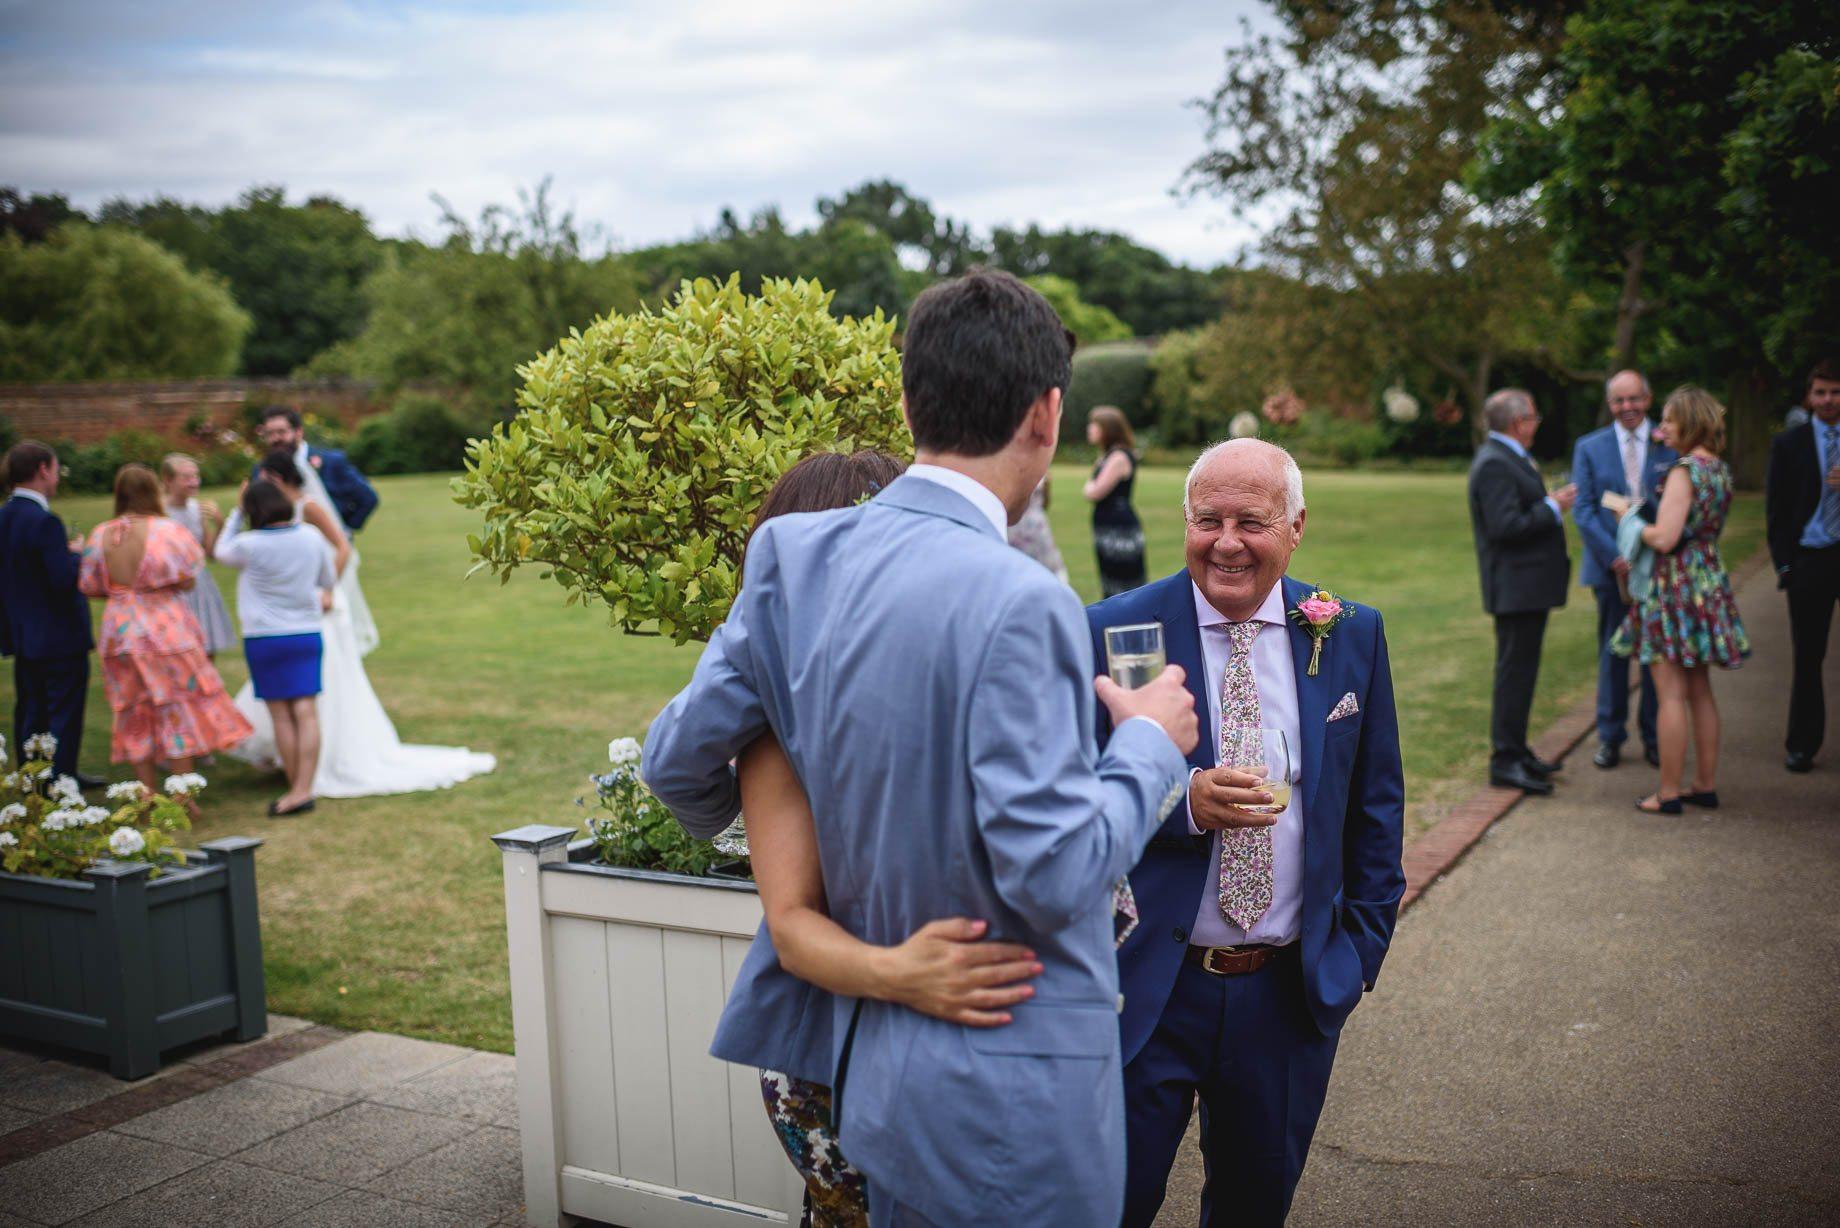 Gaynes Park wedding photography - Guy Collier Photography - Rachel and Jon (102 of 169)